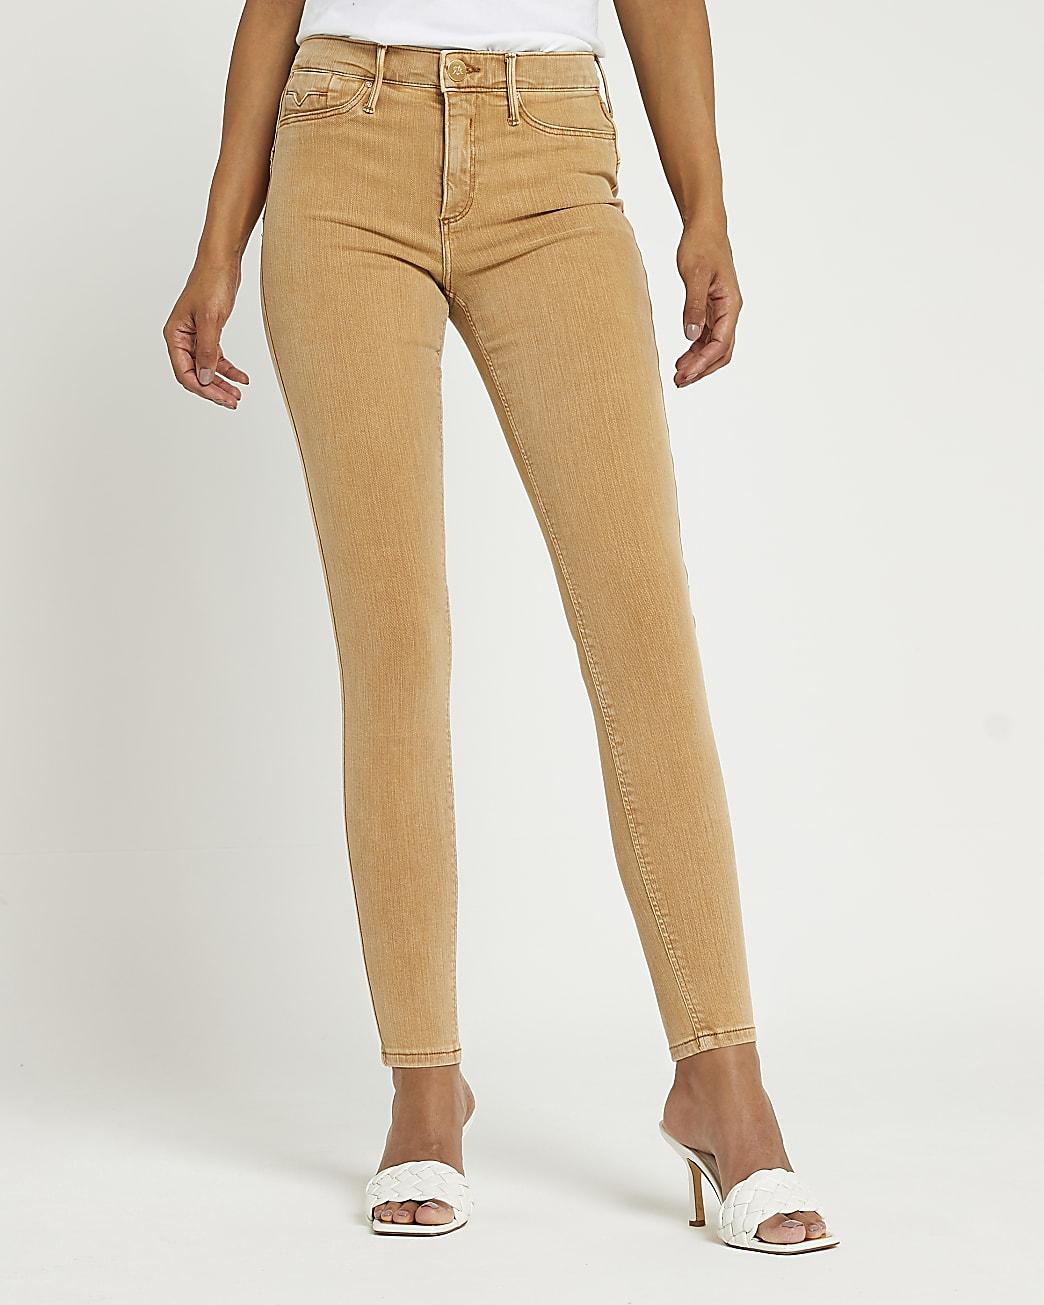 Beige Molly mid rise bum sculpt skinny jeans